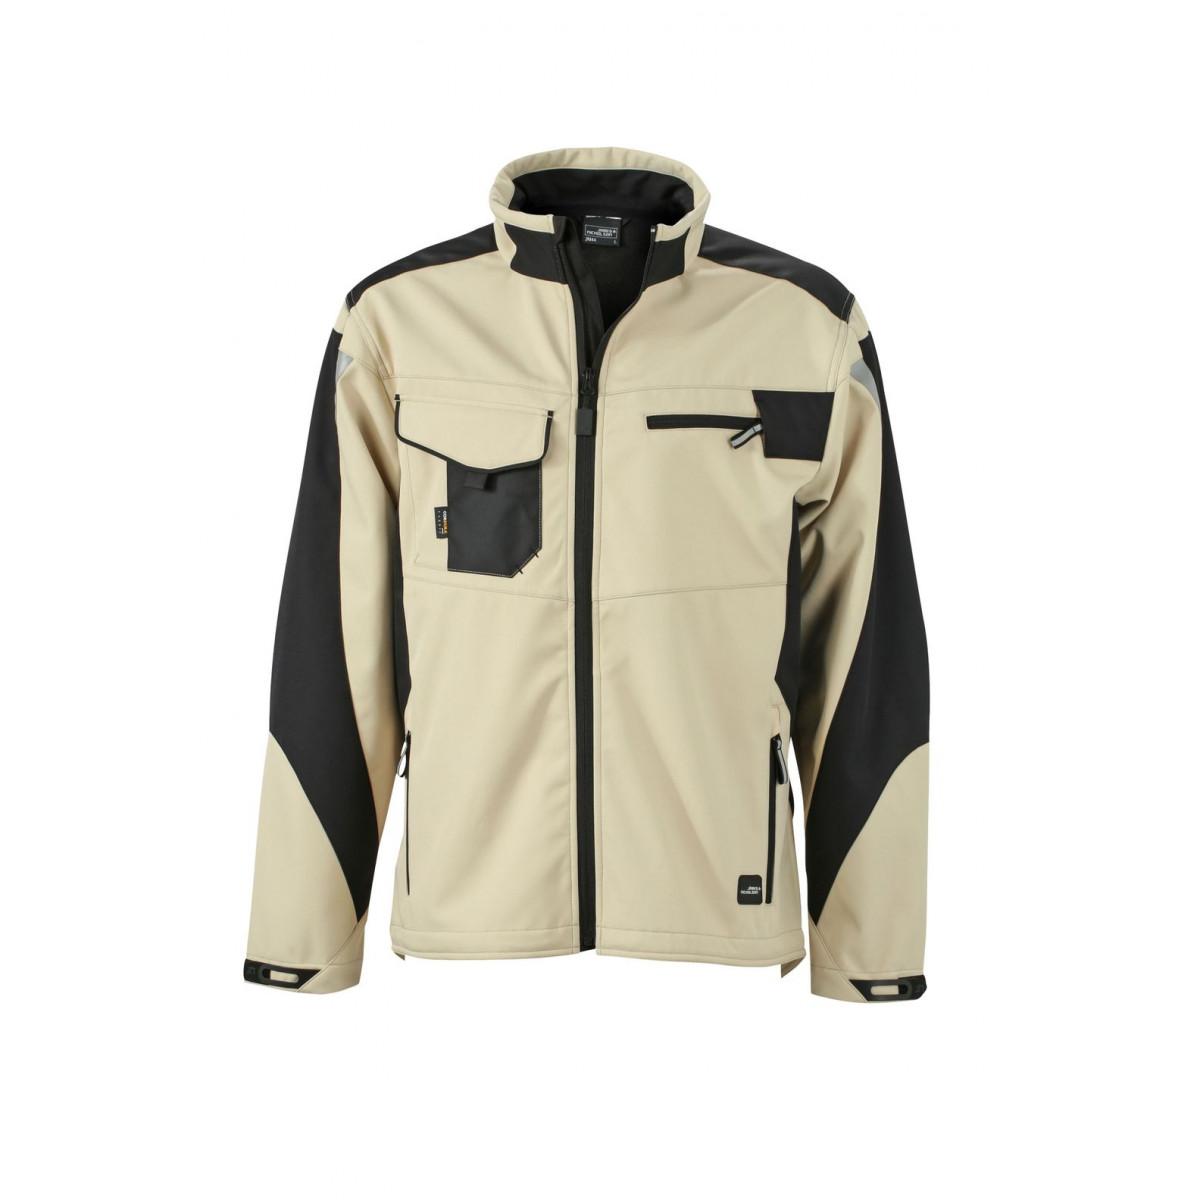 Куртка мужская JN844 Workwear Softshell Jacket - Бежевый/Черный